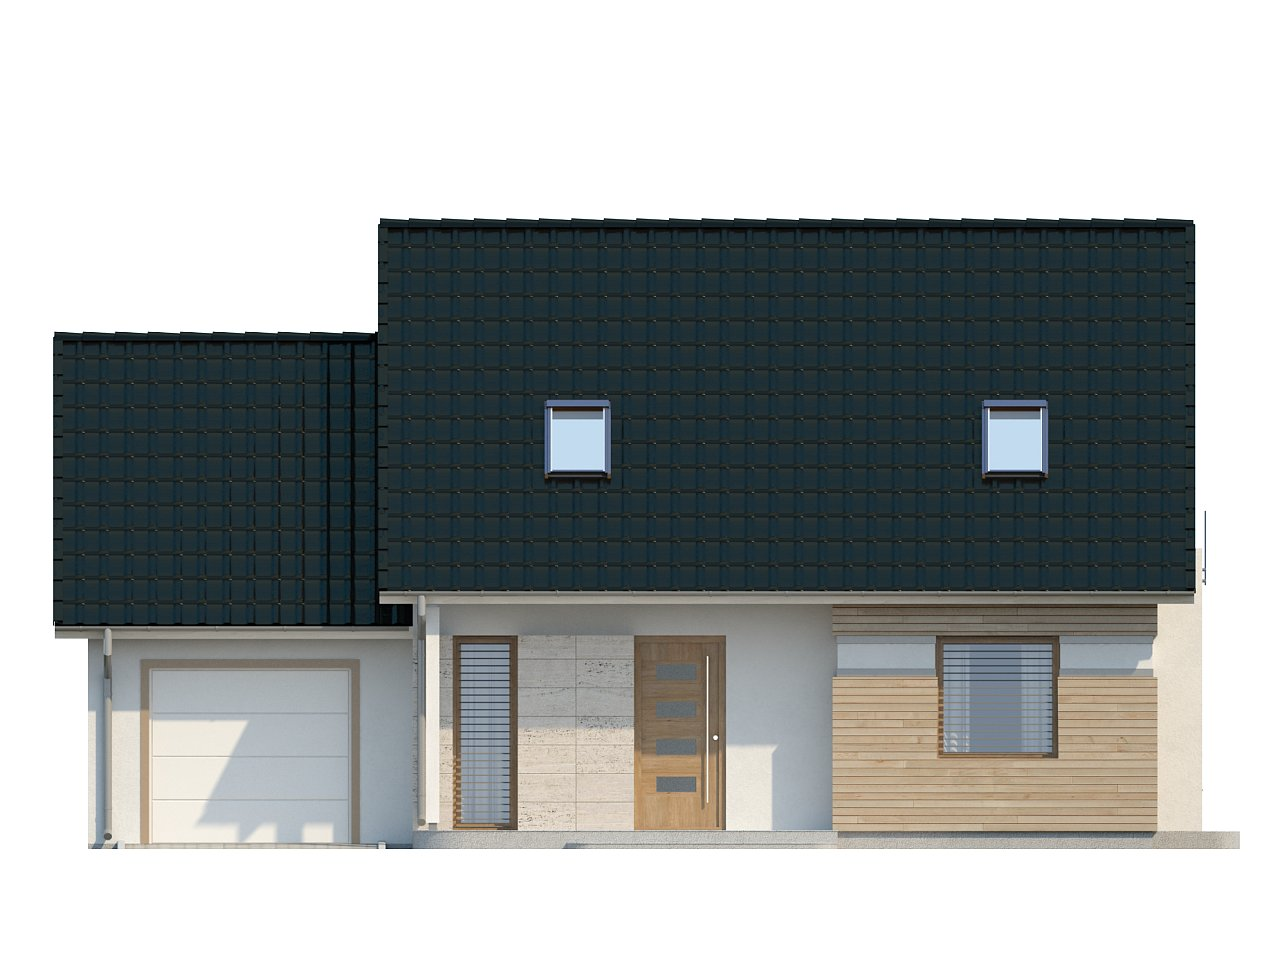 Проект практичного дома с эркером и гаражом на одну машину. 22